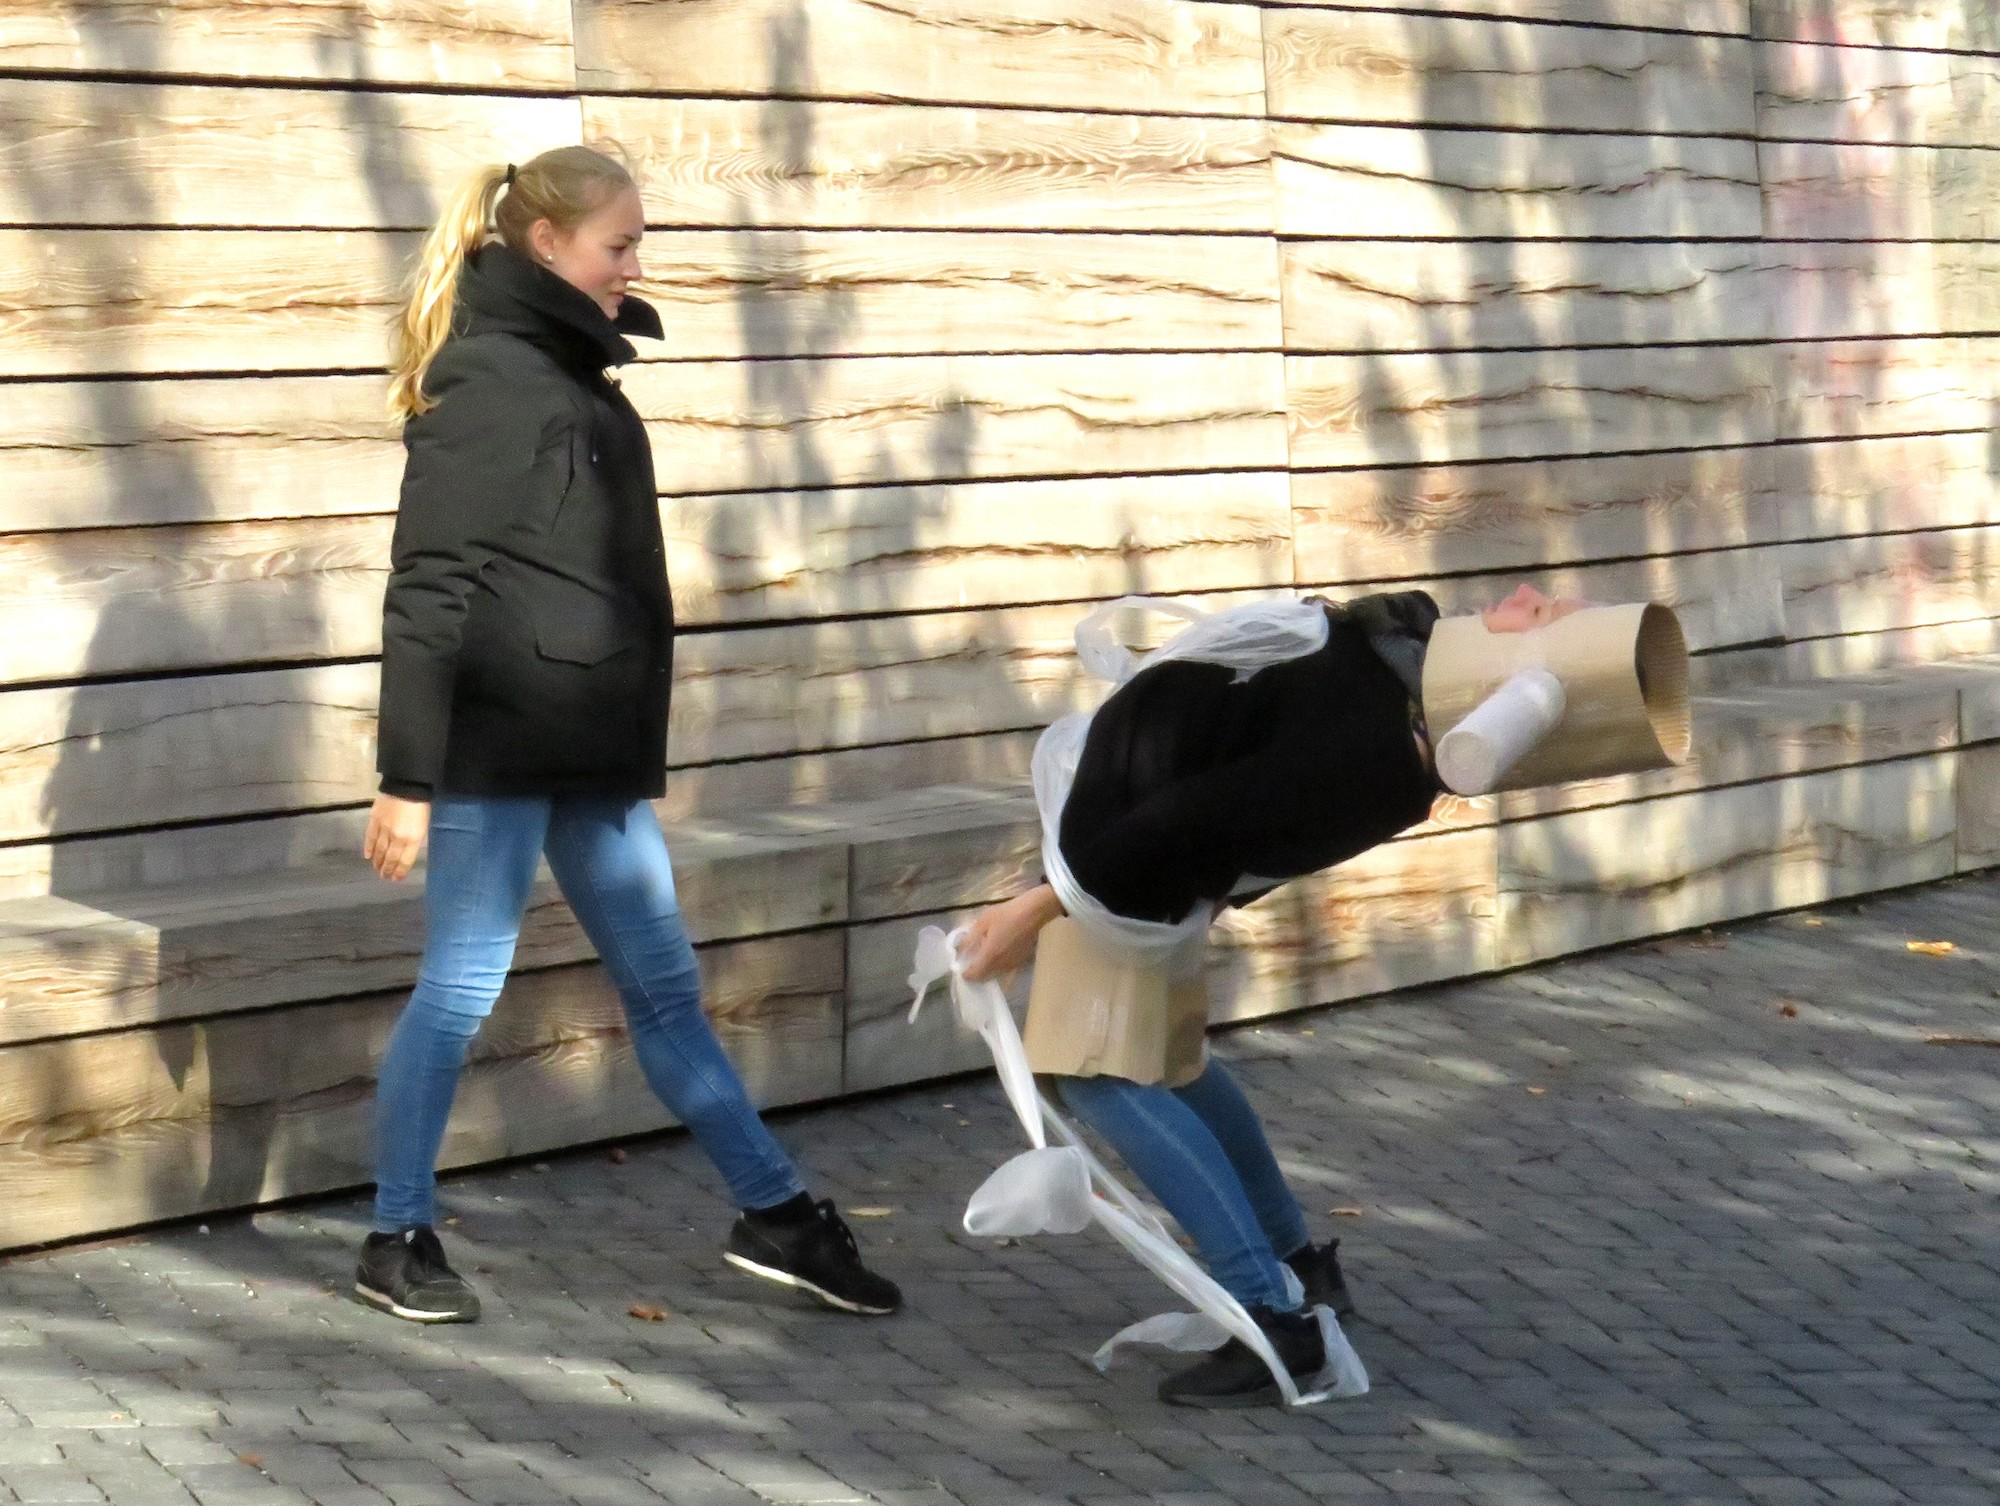 lolaroggeschule-lola-rogge-platz-2018-buggischlolaroggeschule-llola-rogge-platz-2018-buggischIMG_1320-1